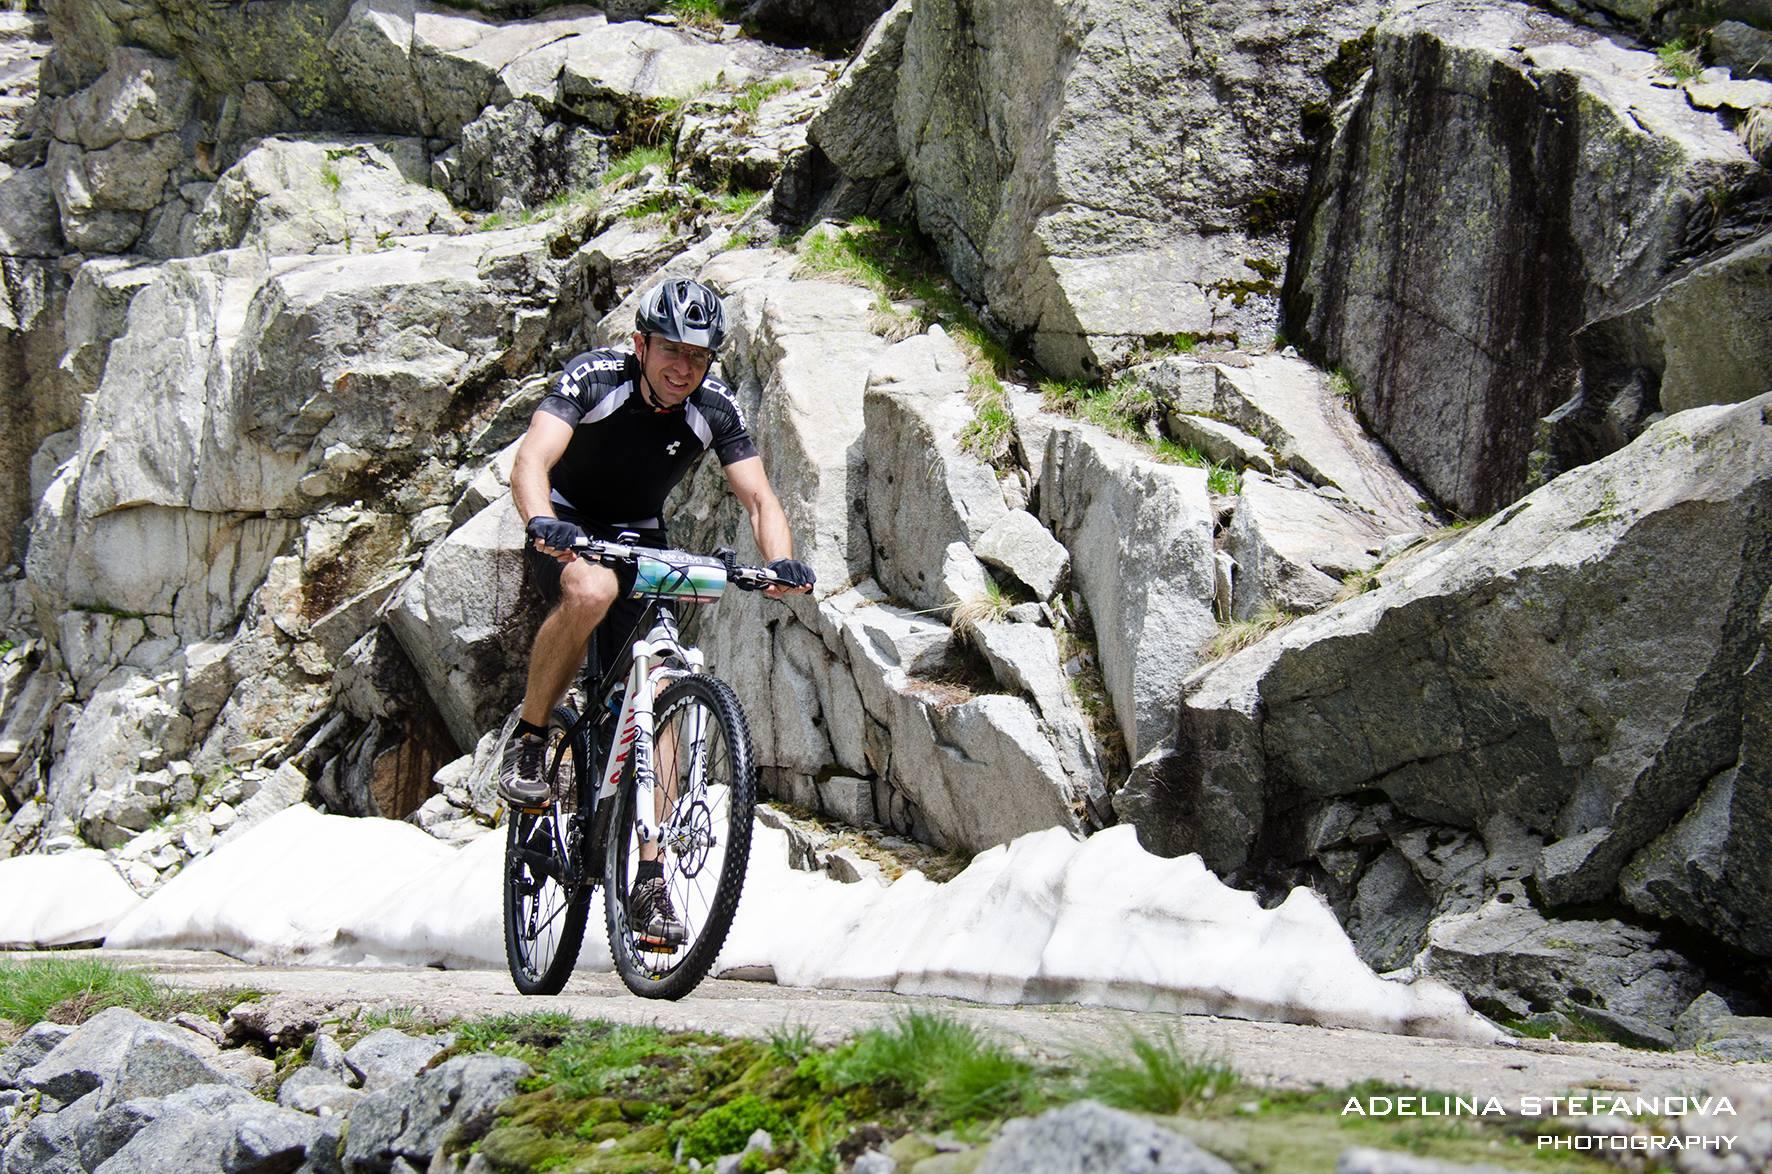 Ride or Run Rila (Jul) – 1400+m climb in 12 km